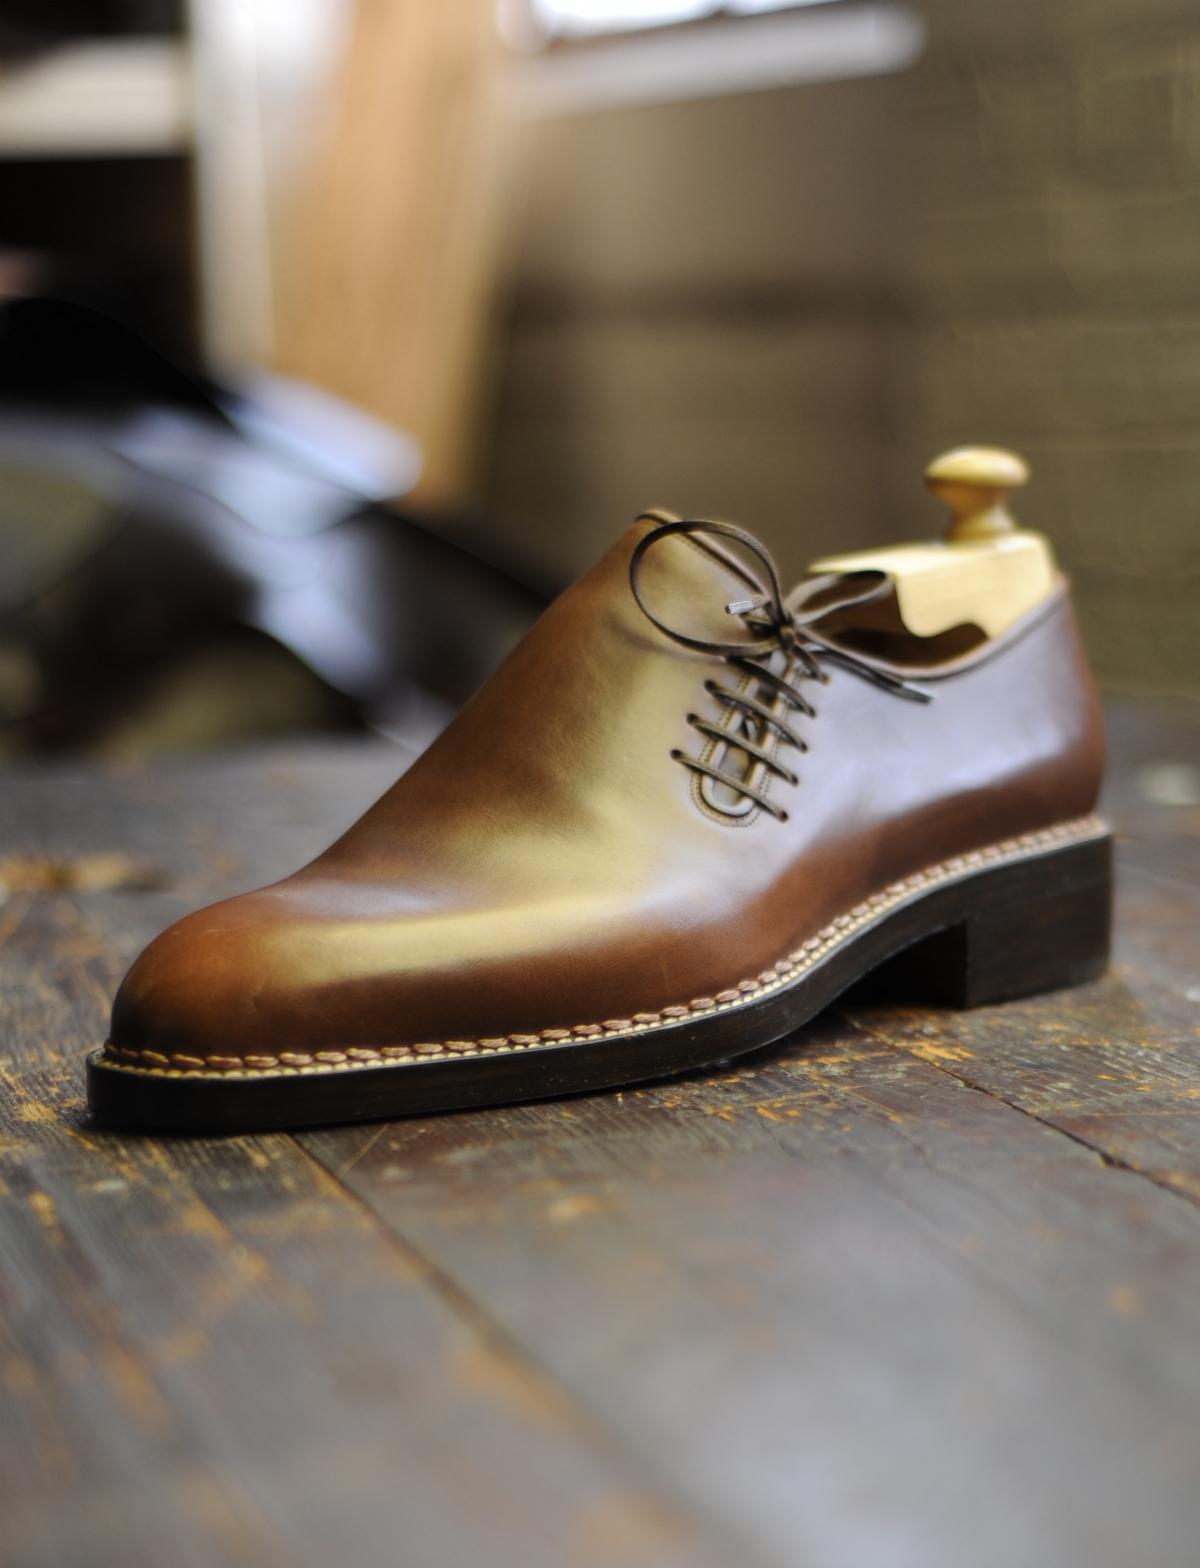 Ботинки Wholecut из Horween Chromexcel, Stefano Bemer